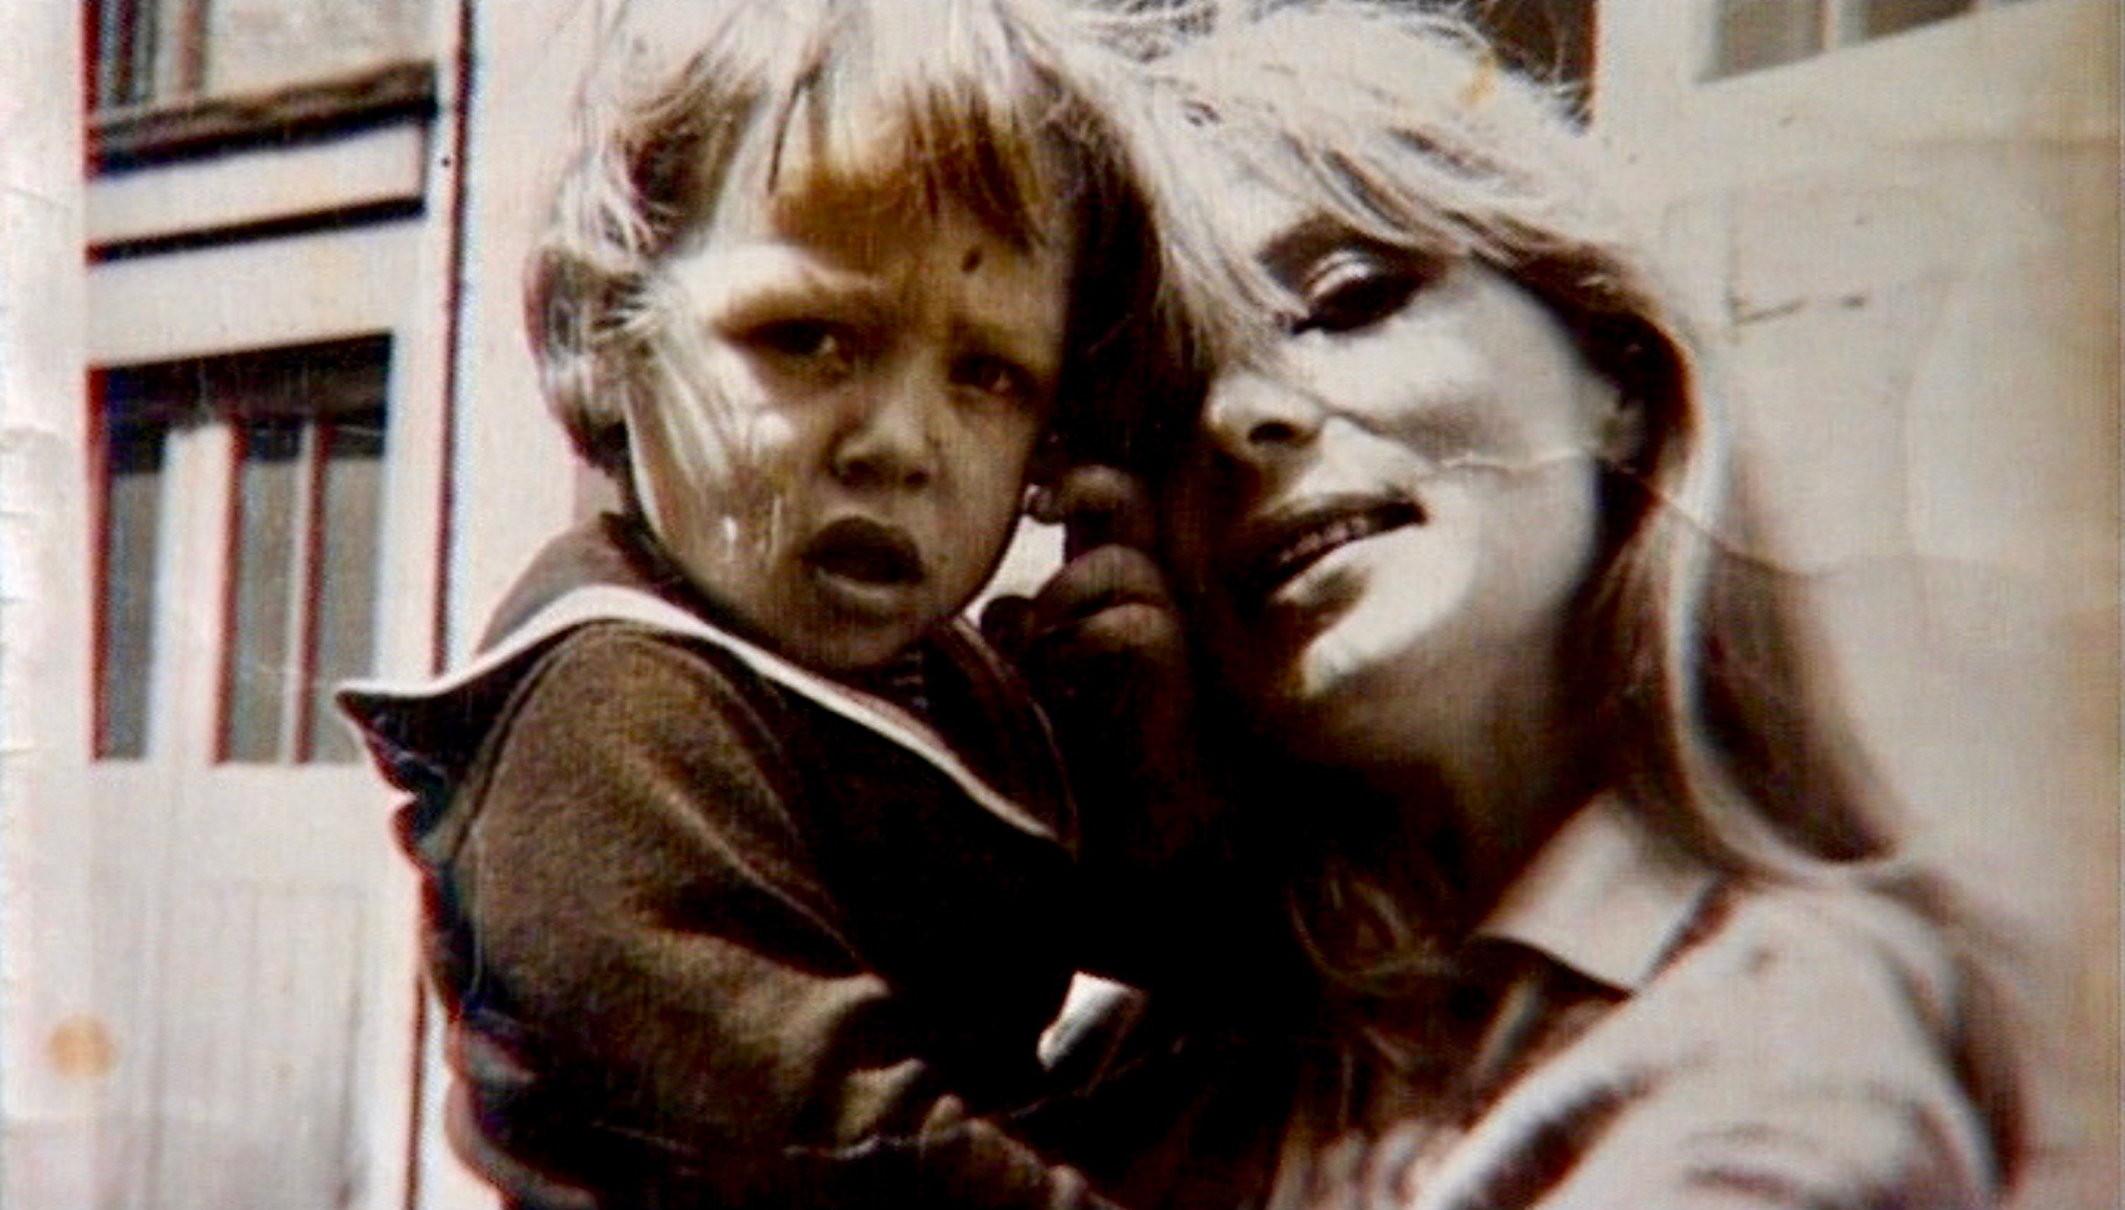 Nico Icon mit Sohn Ari - Regie Susanne Ofteringer - Kamera Judith Kaufmann